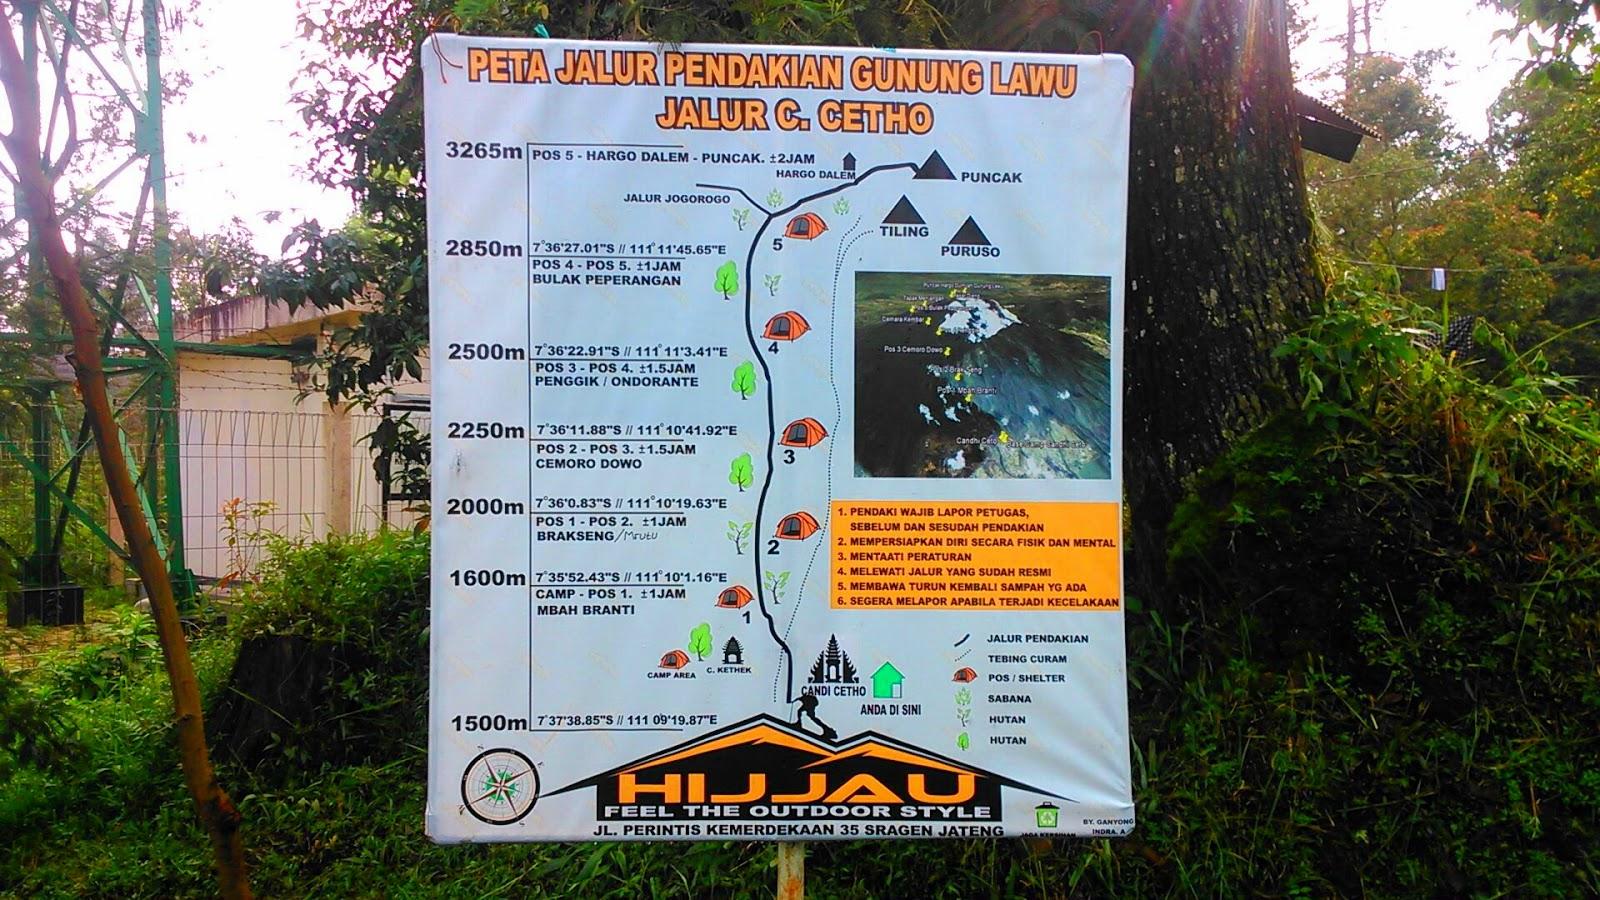 Paket Pendakian Lawu Naik Candi Cetho Turun Candi Cetho Xplore Wisata Operator Wisata Dan Provider Pendakian Gunung